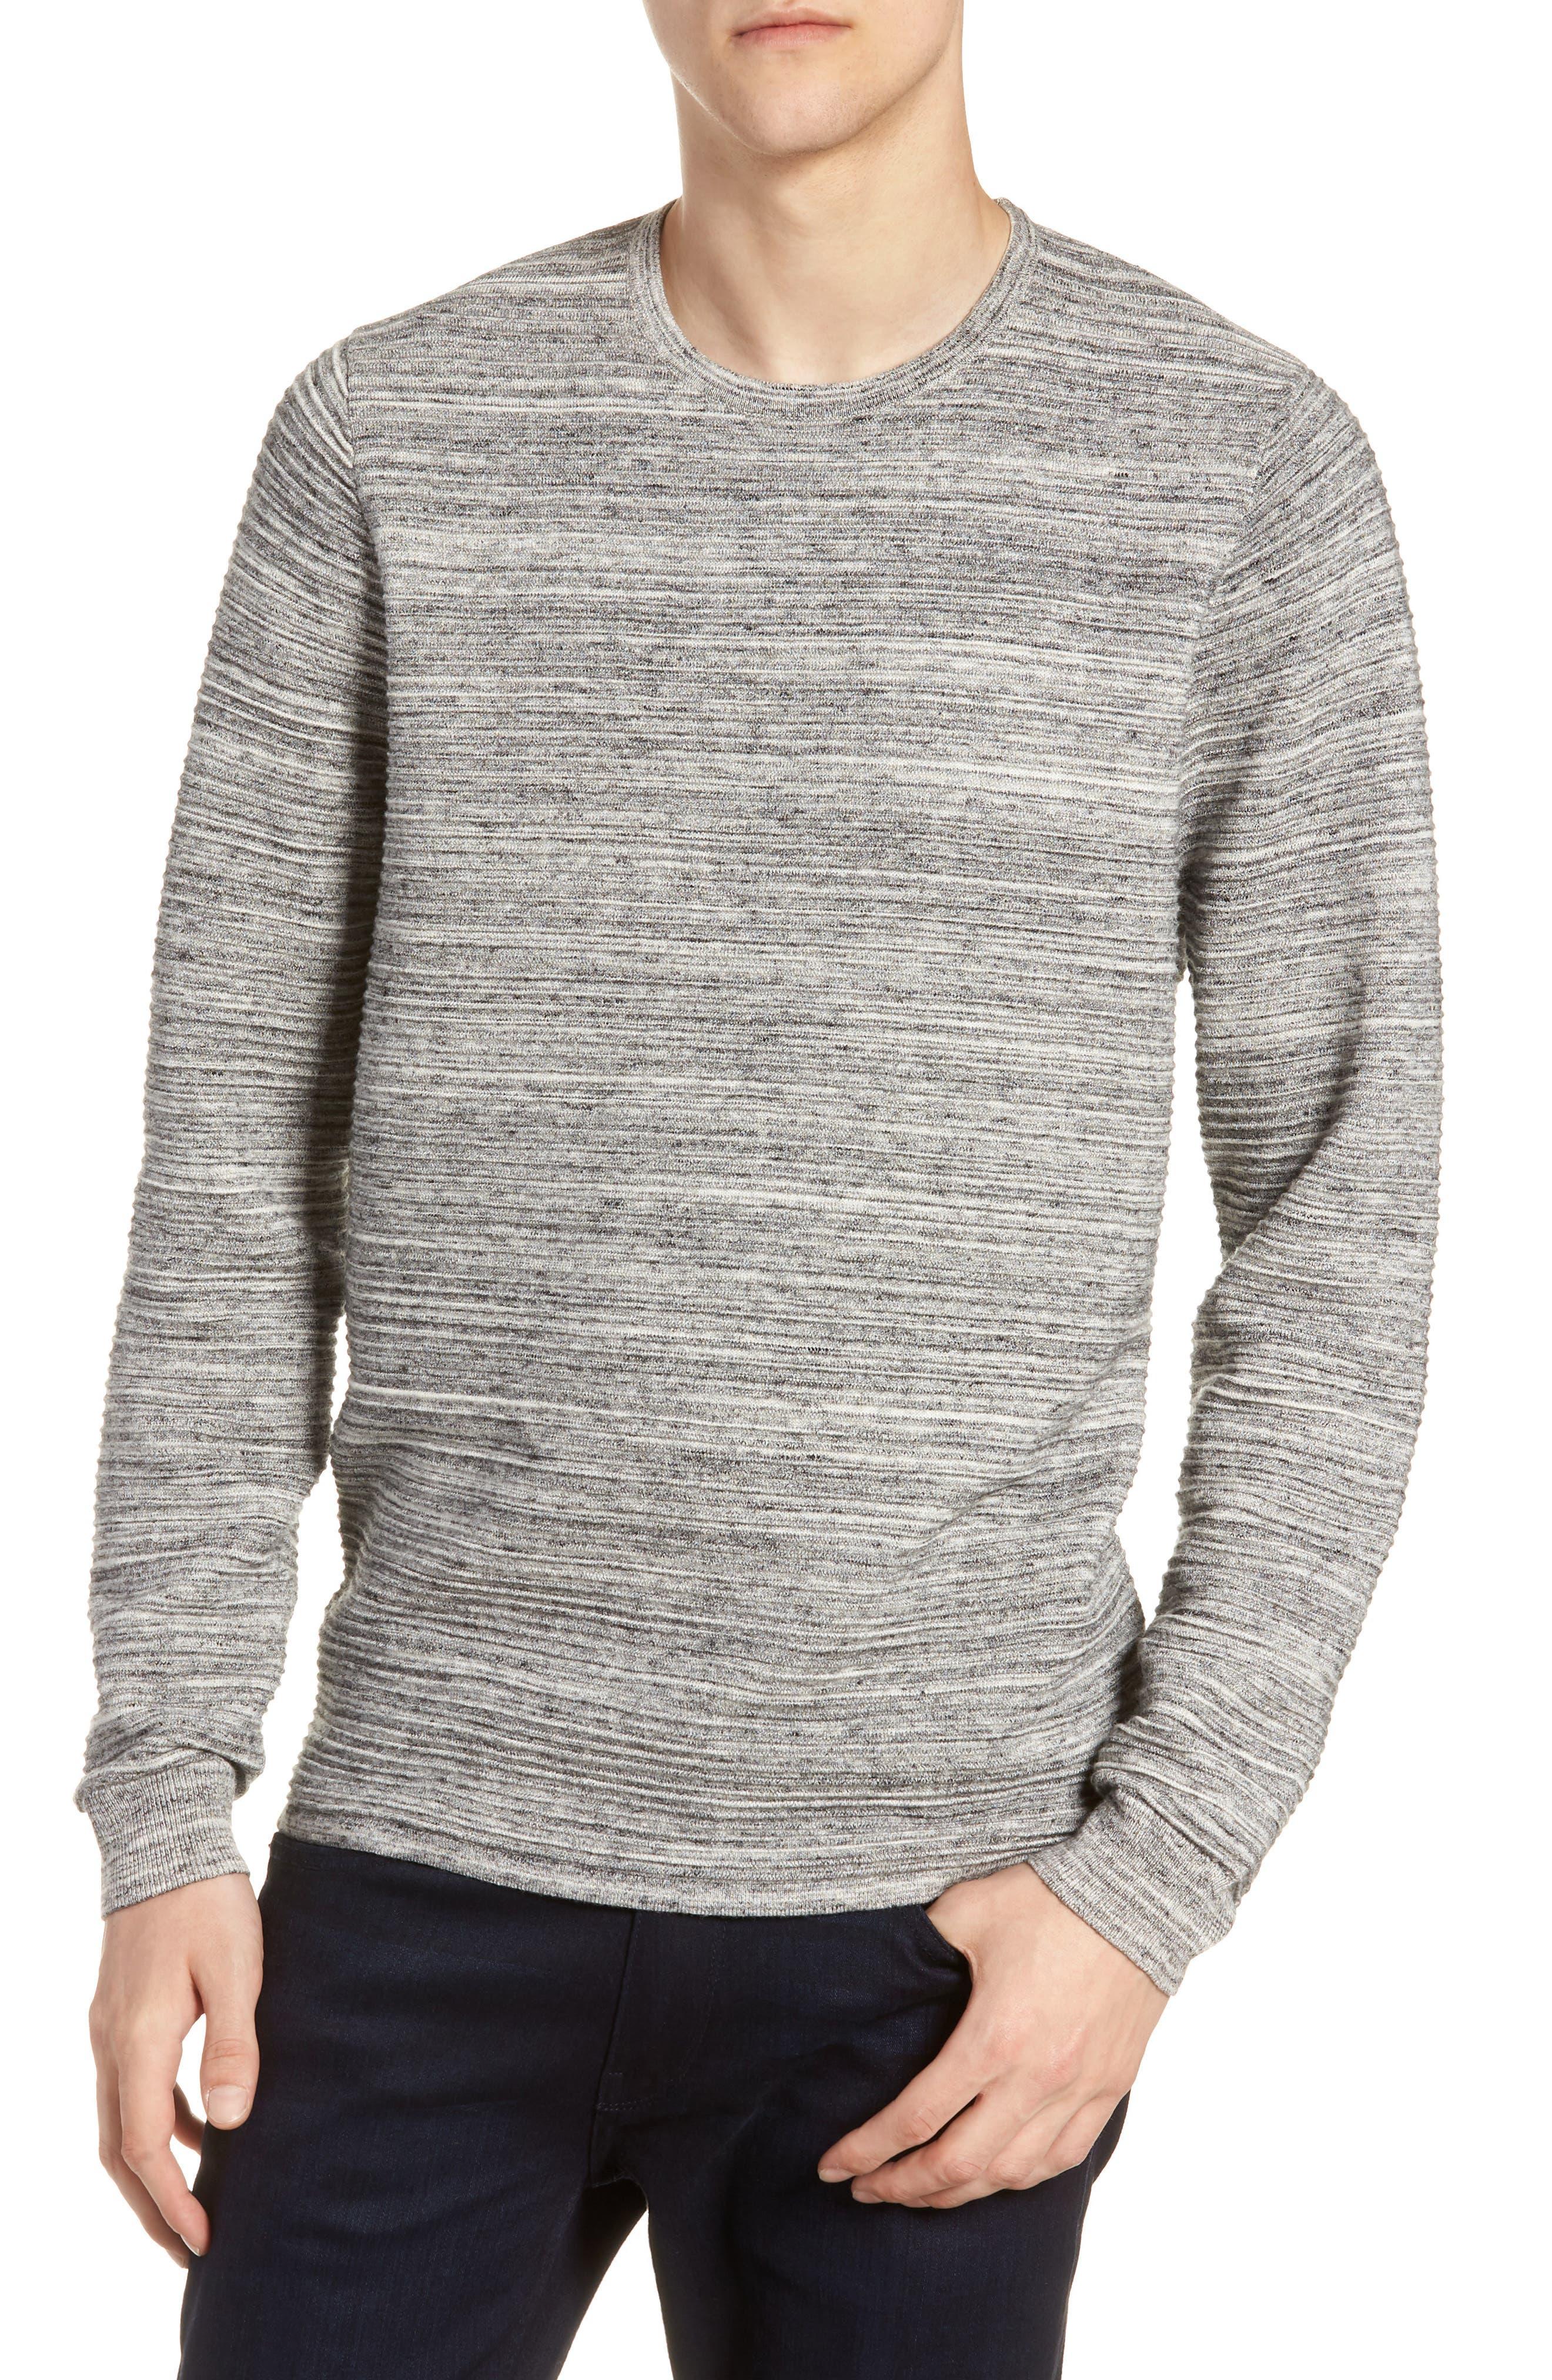 Ottoman Crewneck Sweater,                         Main,                         color, GREY TORNADO SPACEDYE